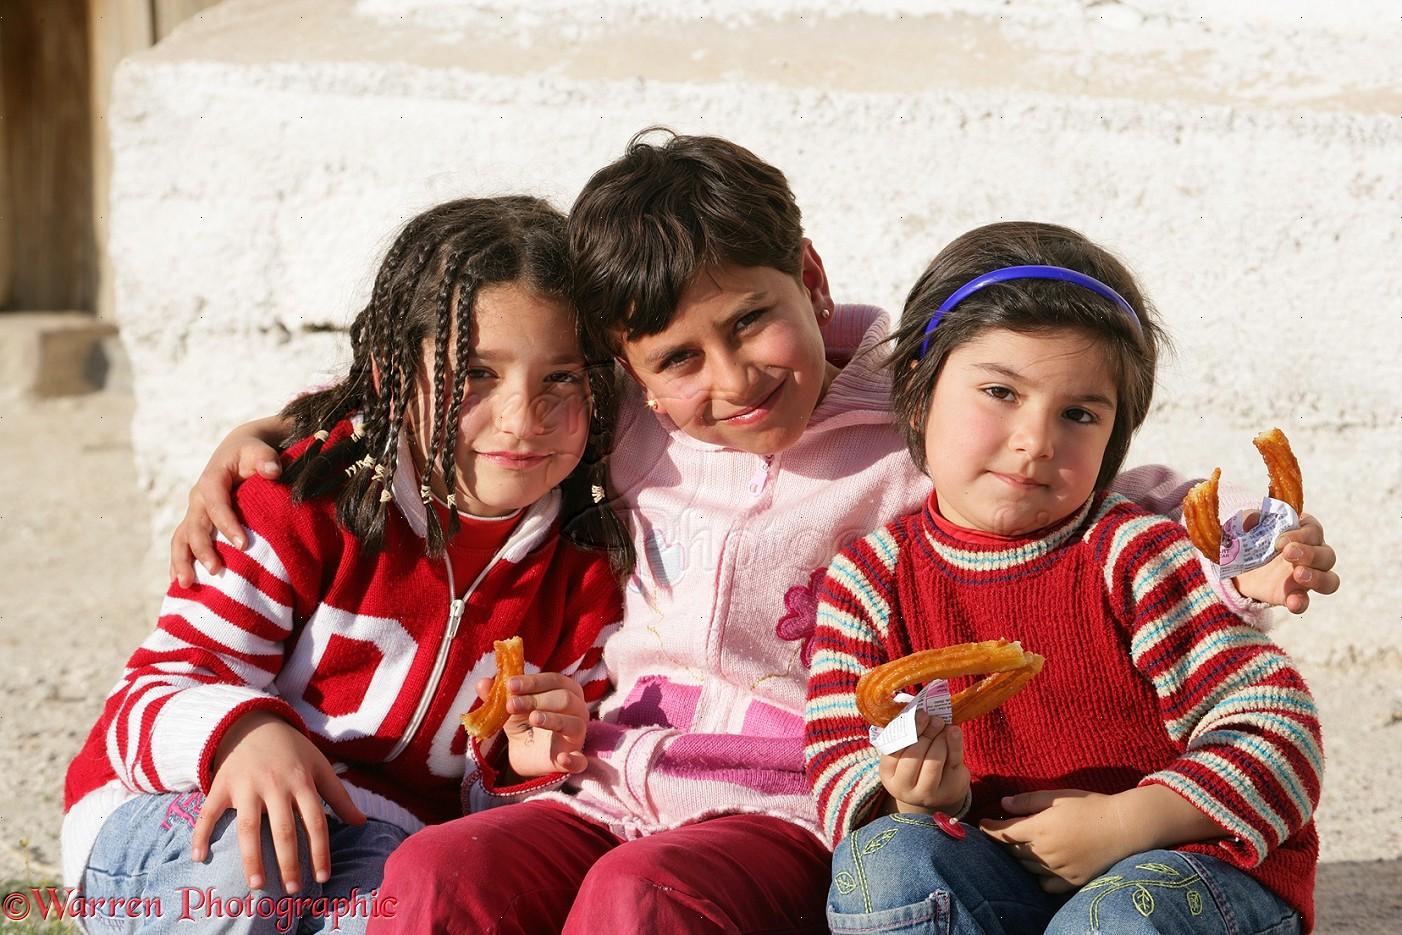 Http Www Warrenphotographic Co Uk 12171 Turkish Children